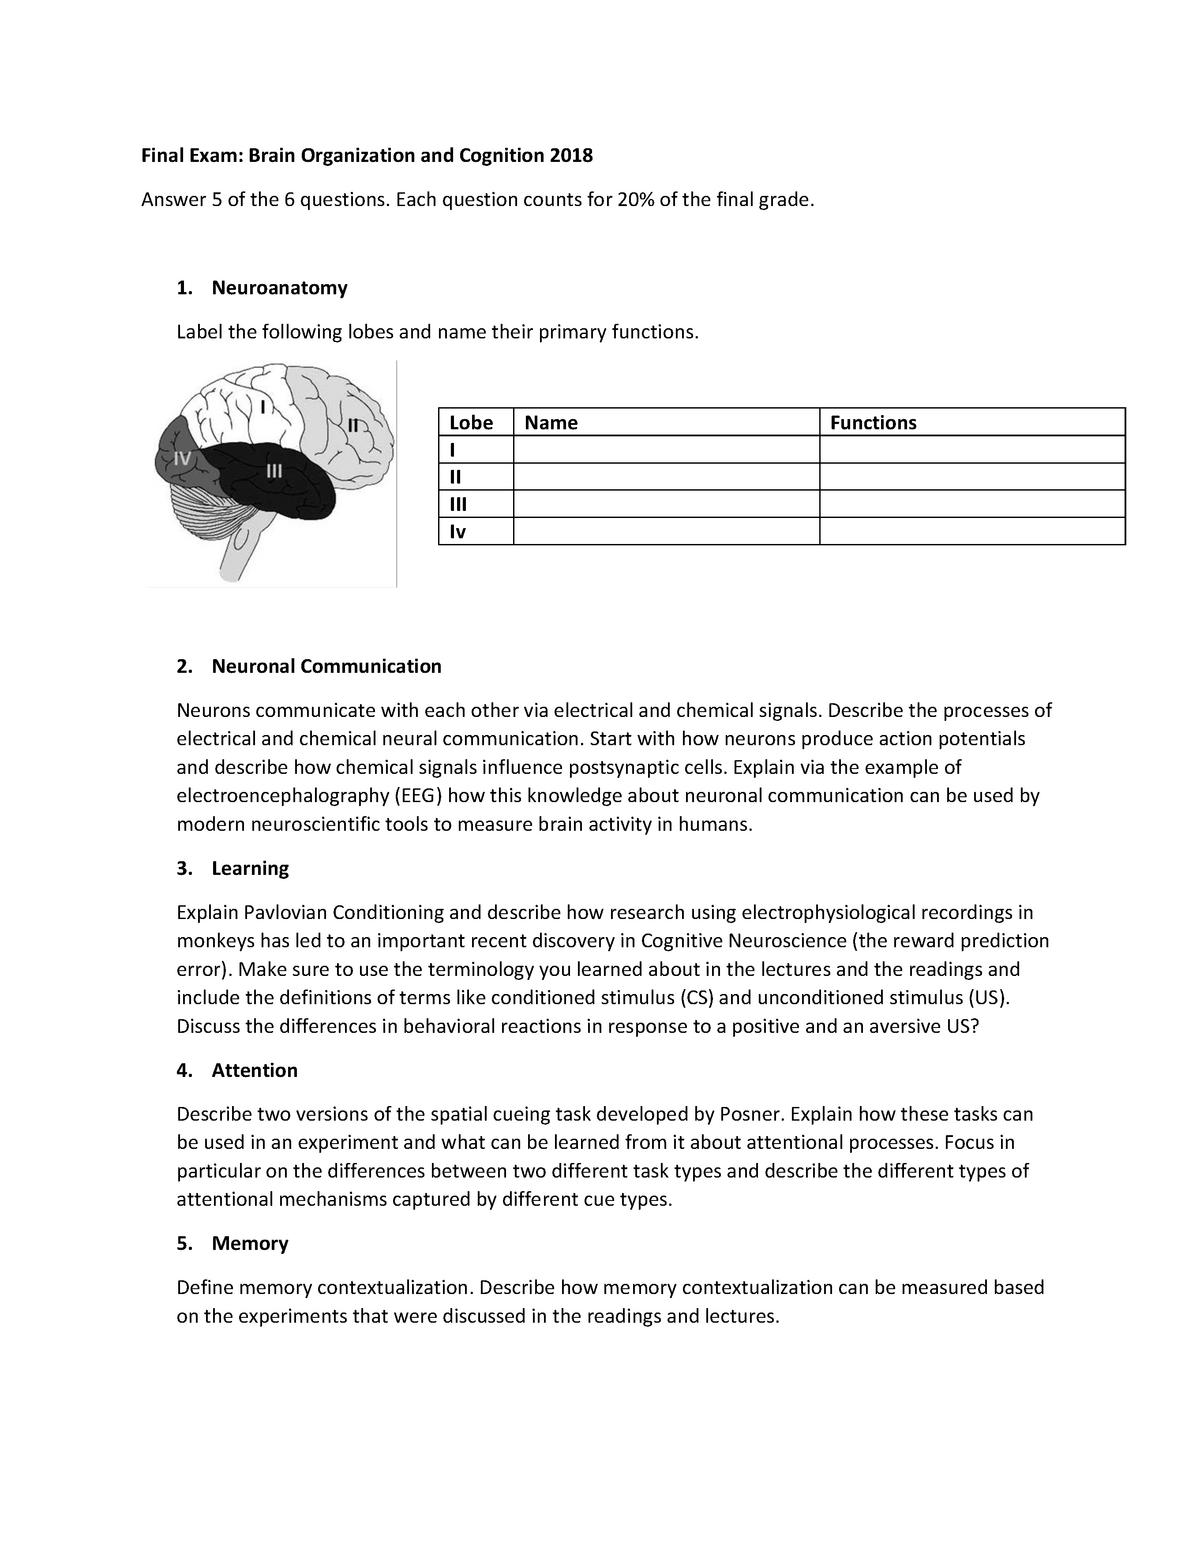 Tentamen 2018 - 6414M0311Y: Brain Organisation and Cognition for